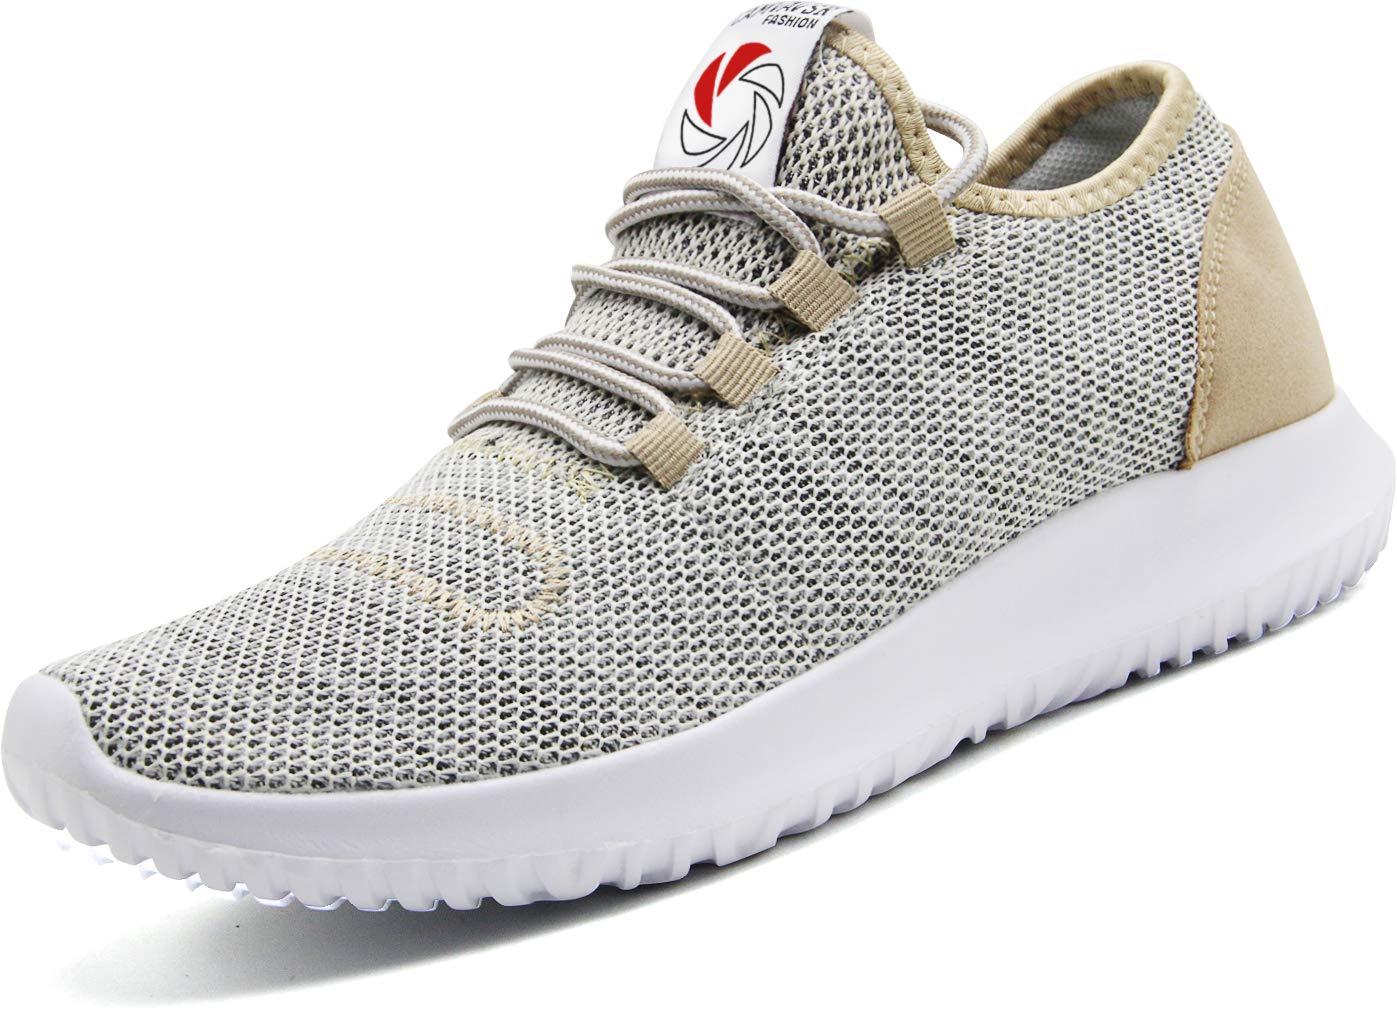 CAMVAVSR Men's Sneakers Fashion Slip on Lightweight Breathable Mesh Soft Sole Walking Running Jogging Shoes for Men Gold, 12 M US